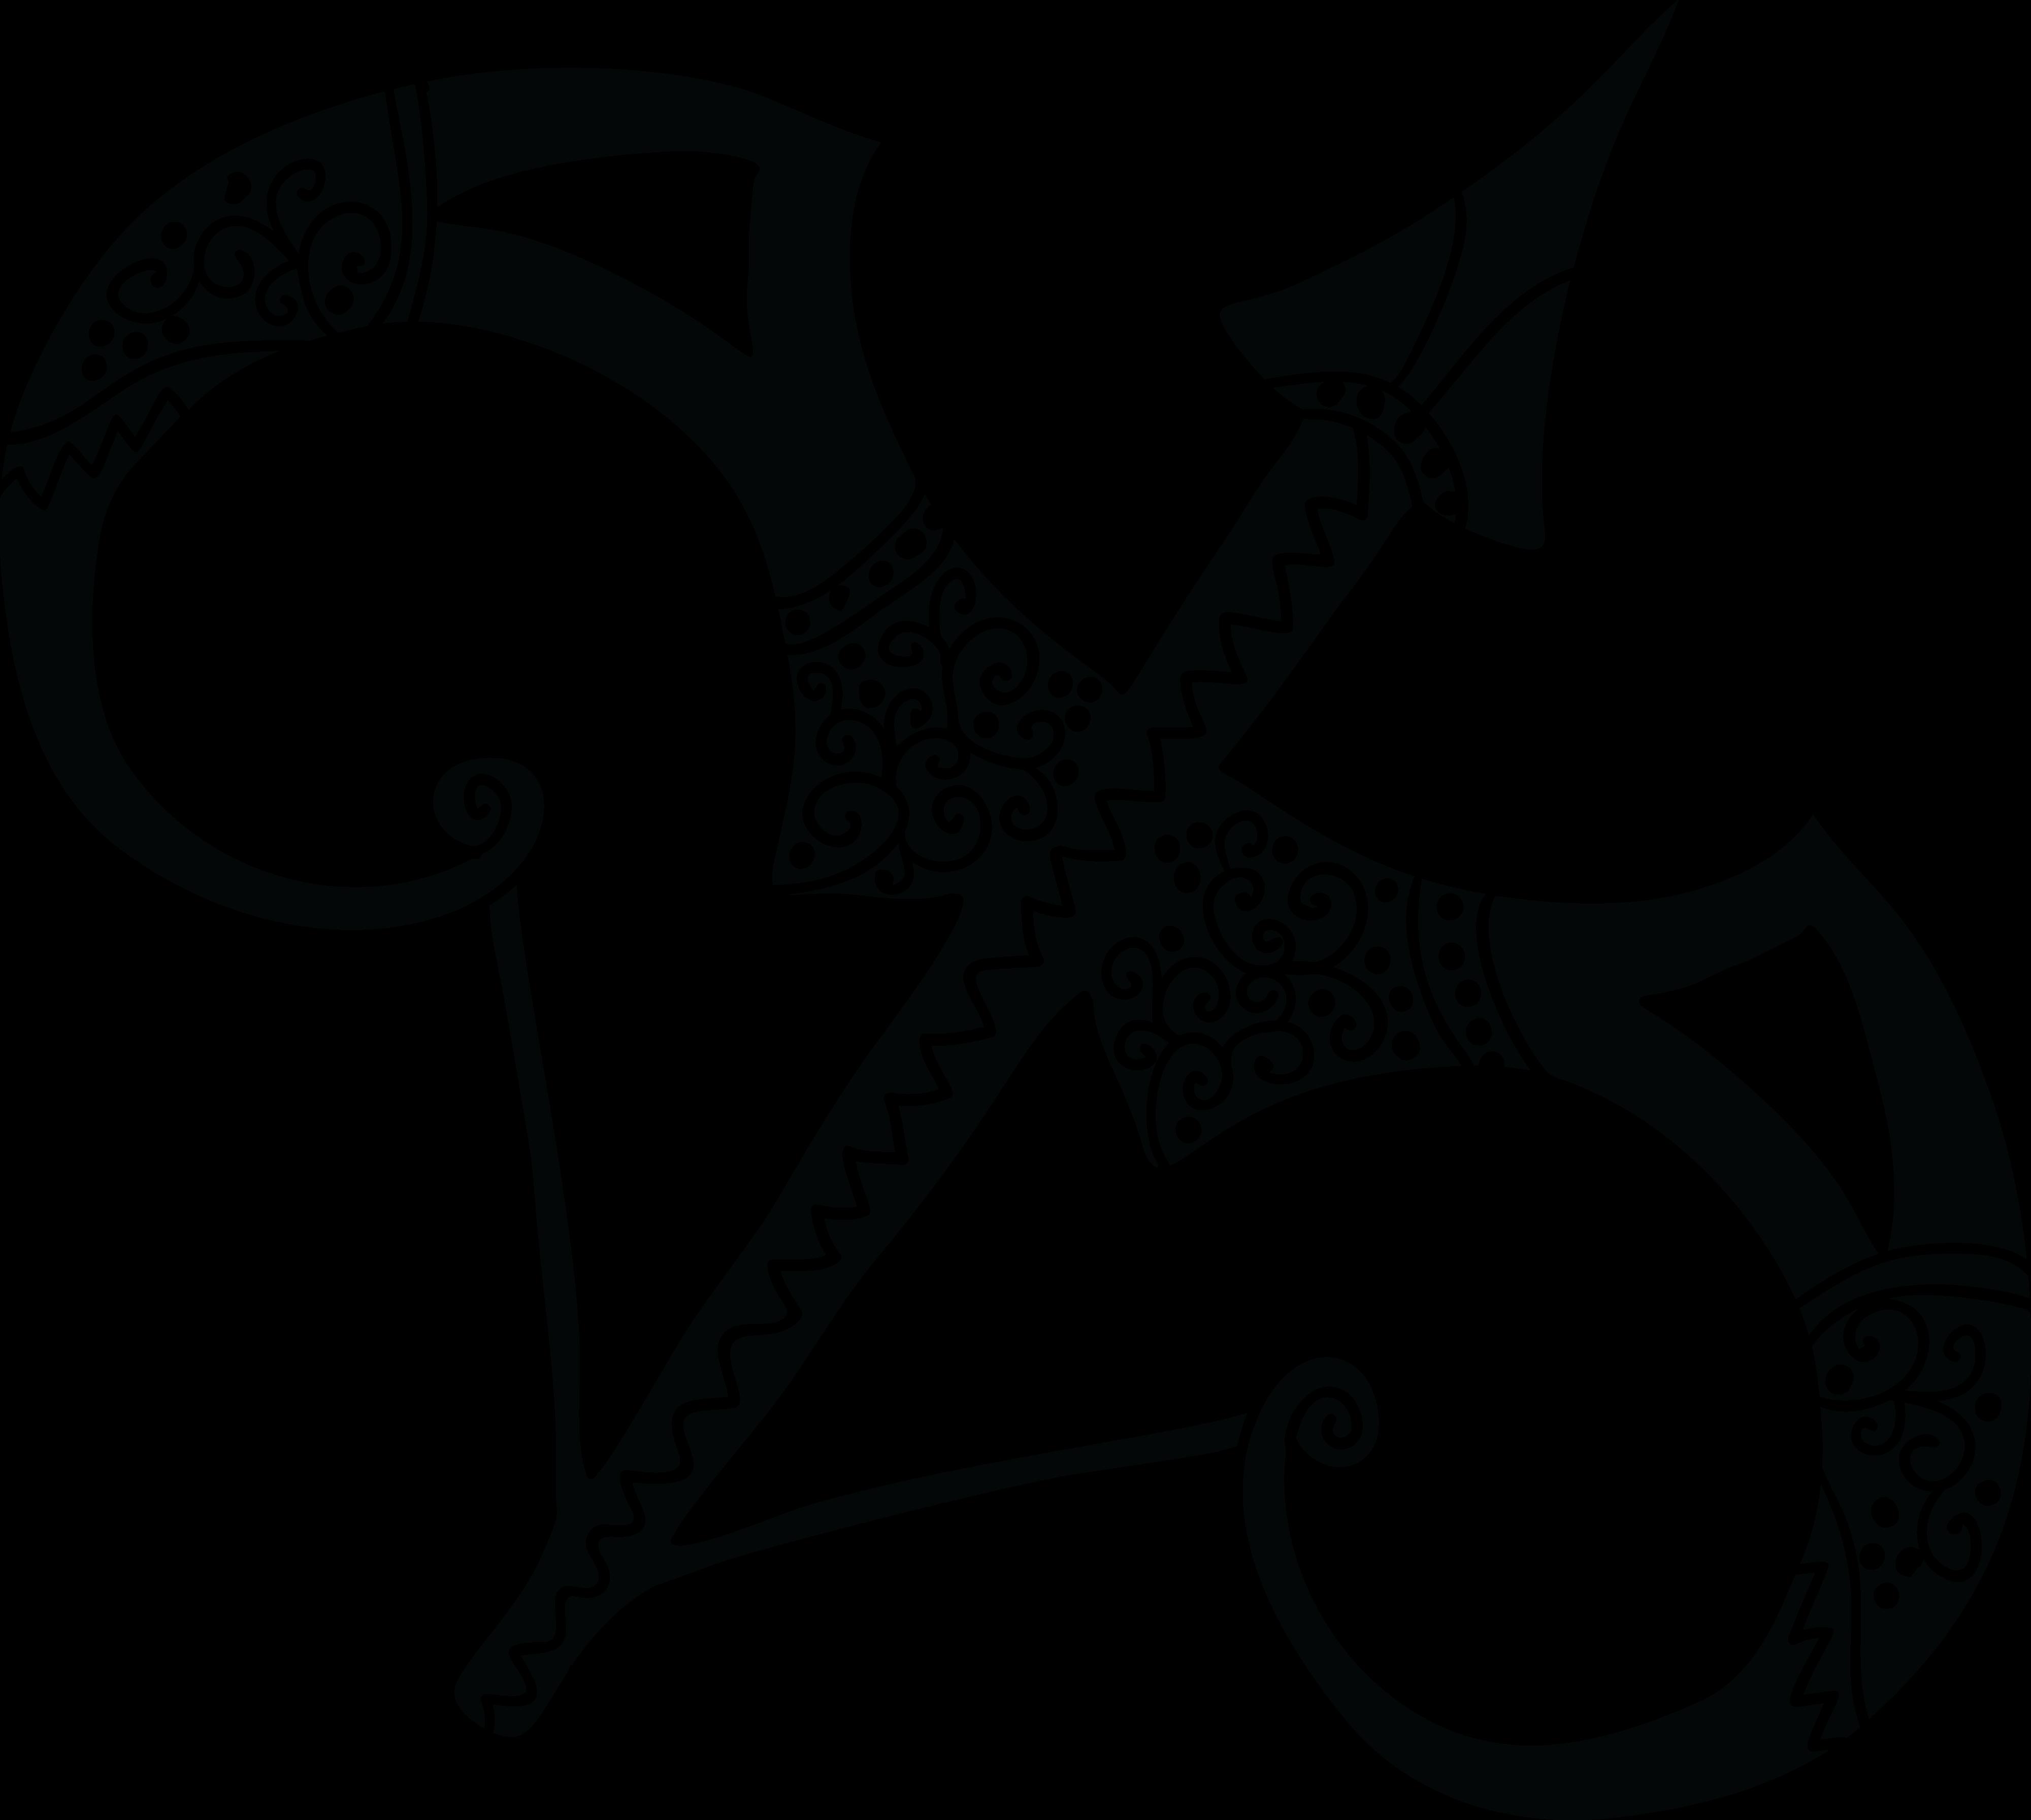 Free Clipart Of A Horoscope Astrology Zodiac Sagittarius.